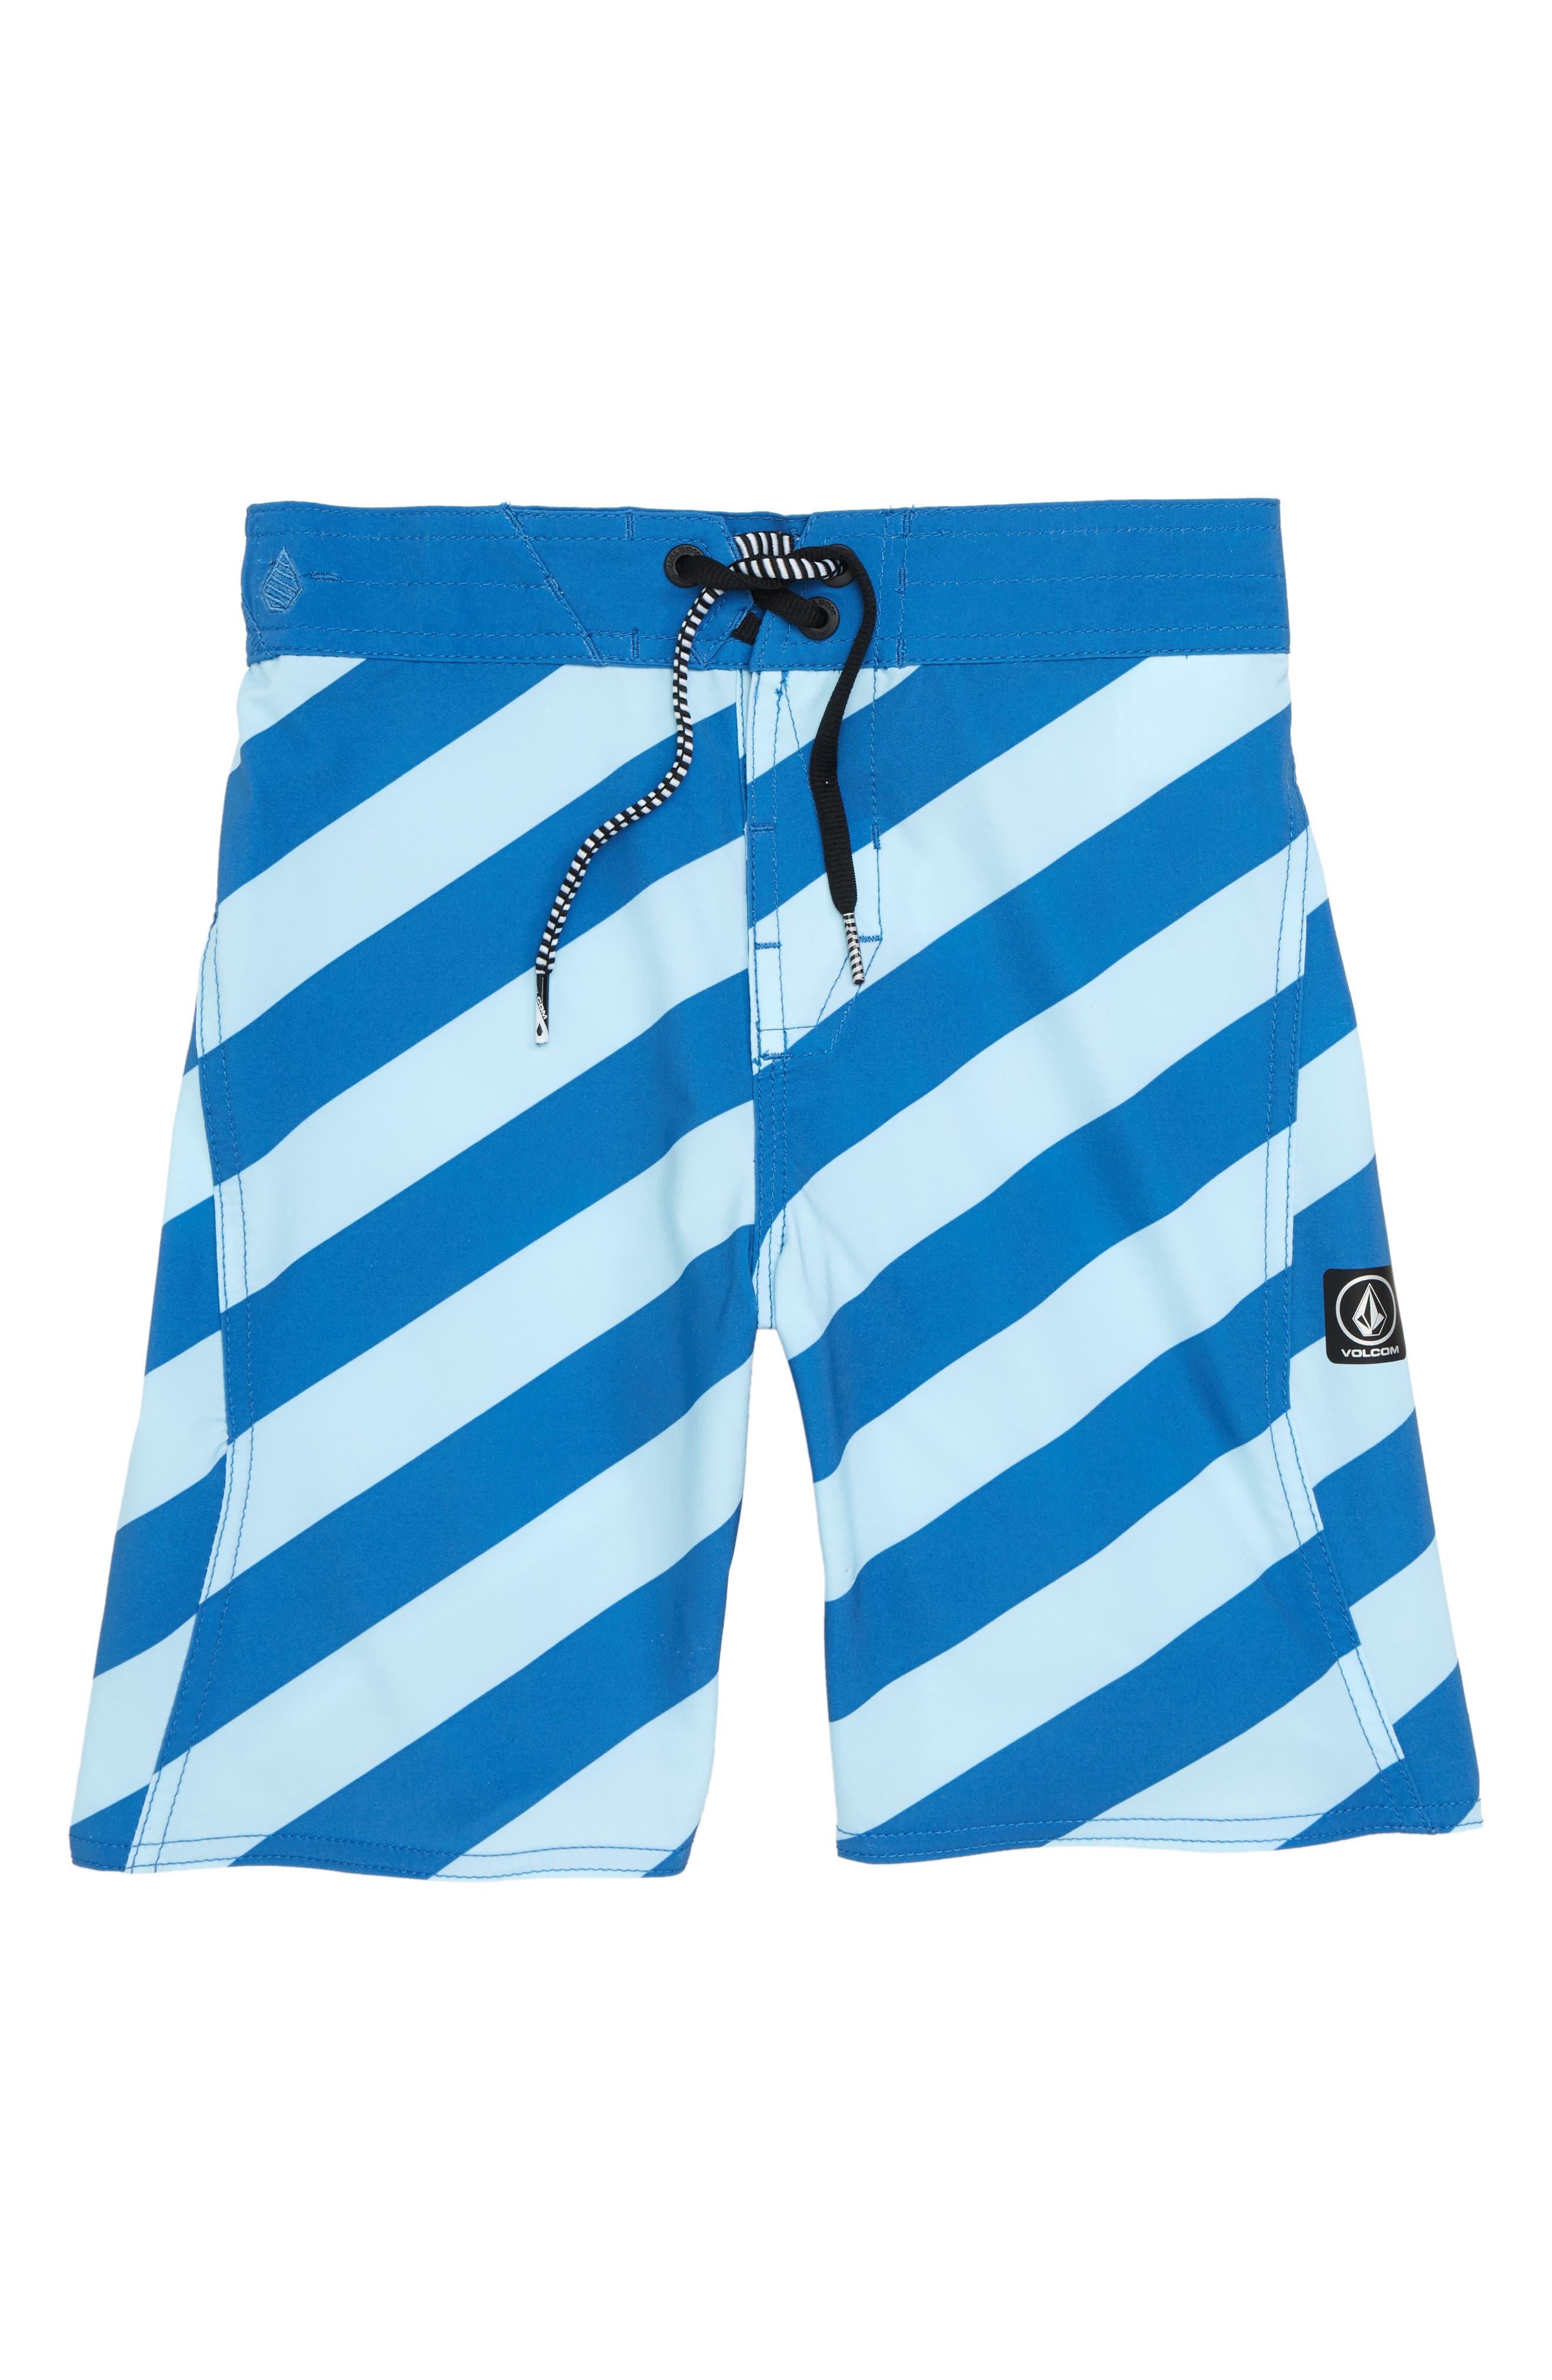 Stripey Swim Trunks,                             Main thumbnail 1, color,                             Arctic Blue